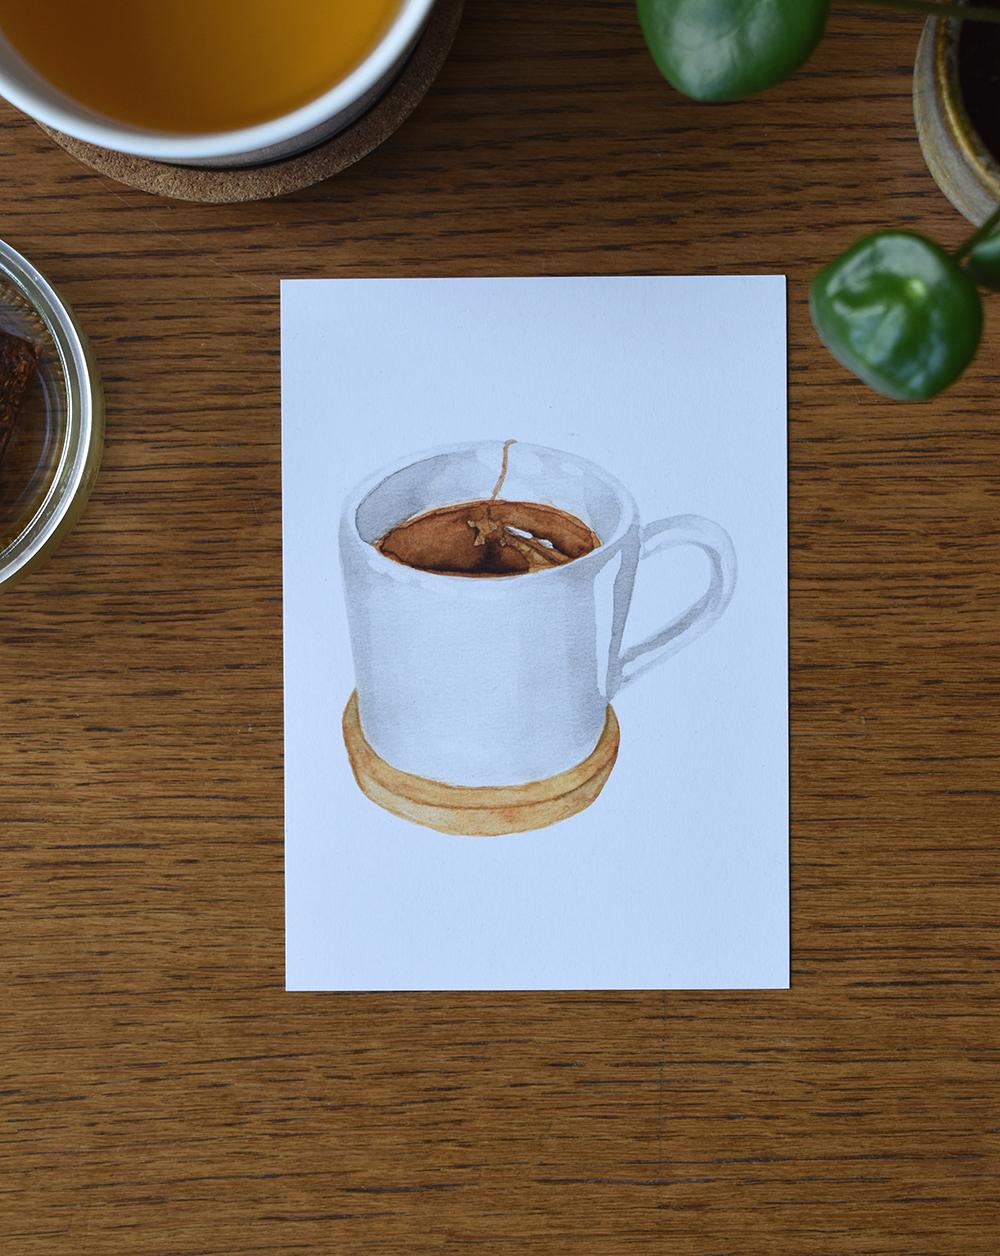 My cup of tea 05 - studio katipeifer